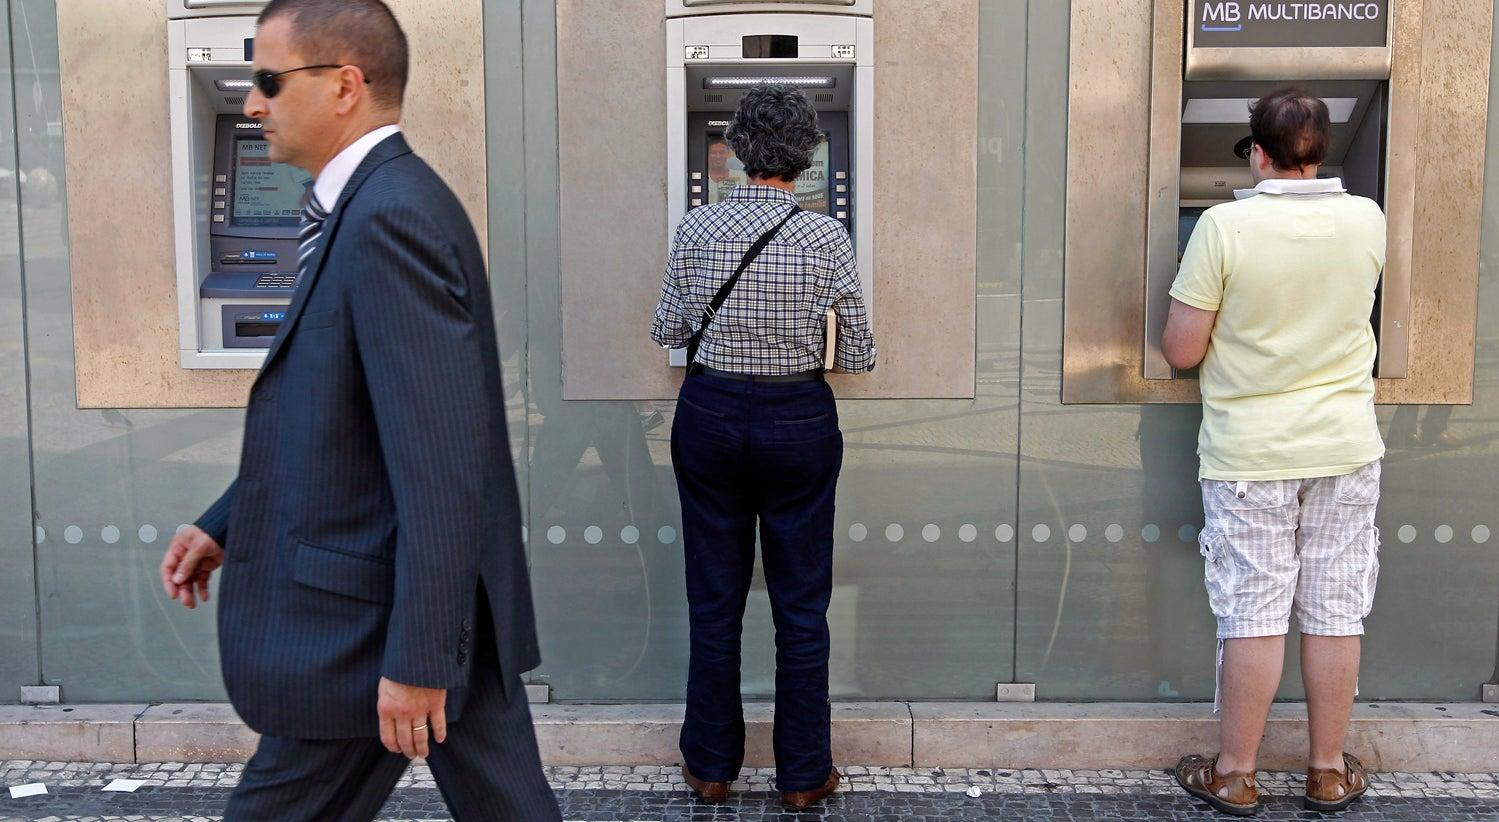 Economia - Quatro milh�es de portugueses sem p�-de-meia